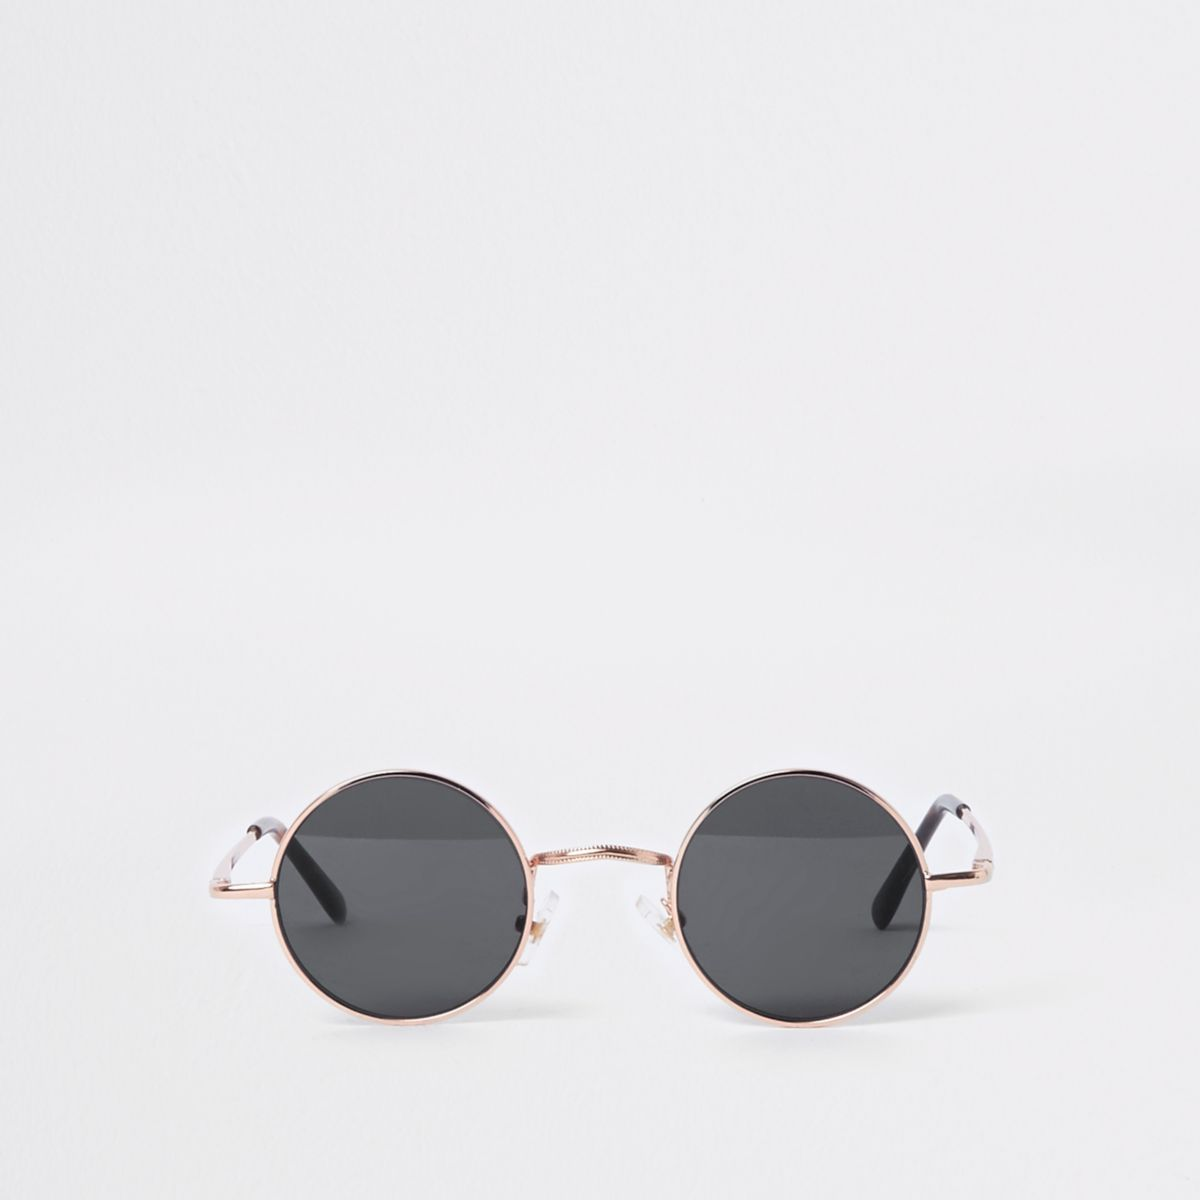 Gold tone round smoke lens sunglasses